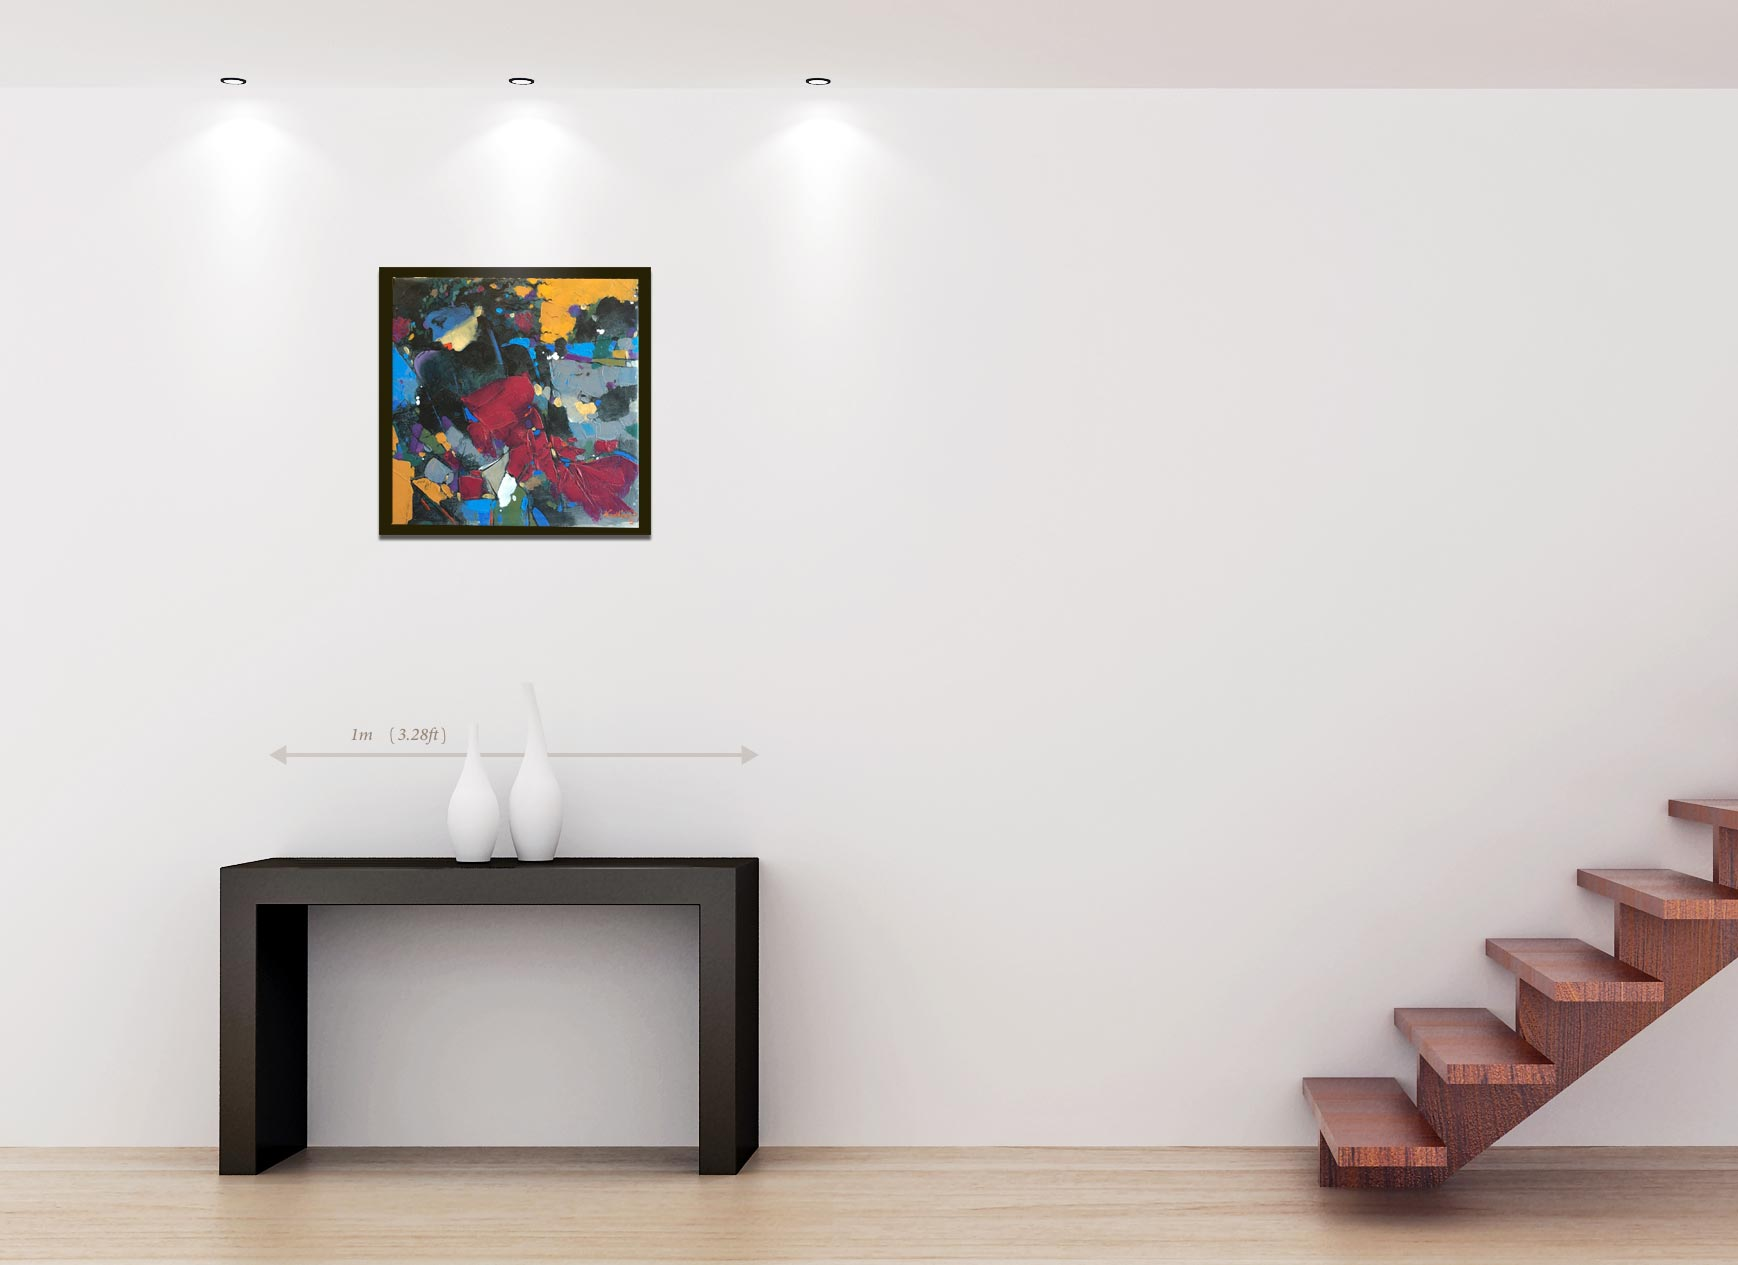 Modern painting رسم تشكيلي حديث